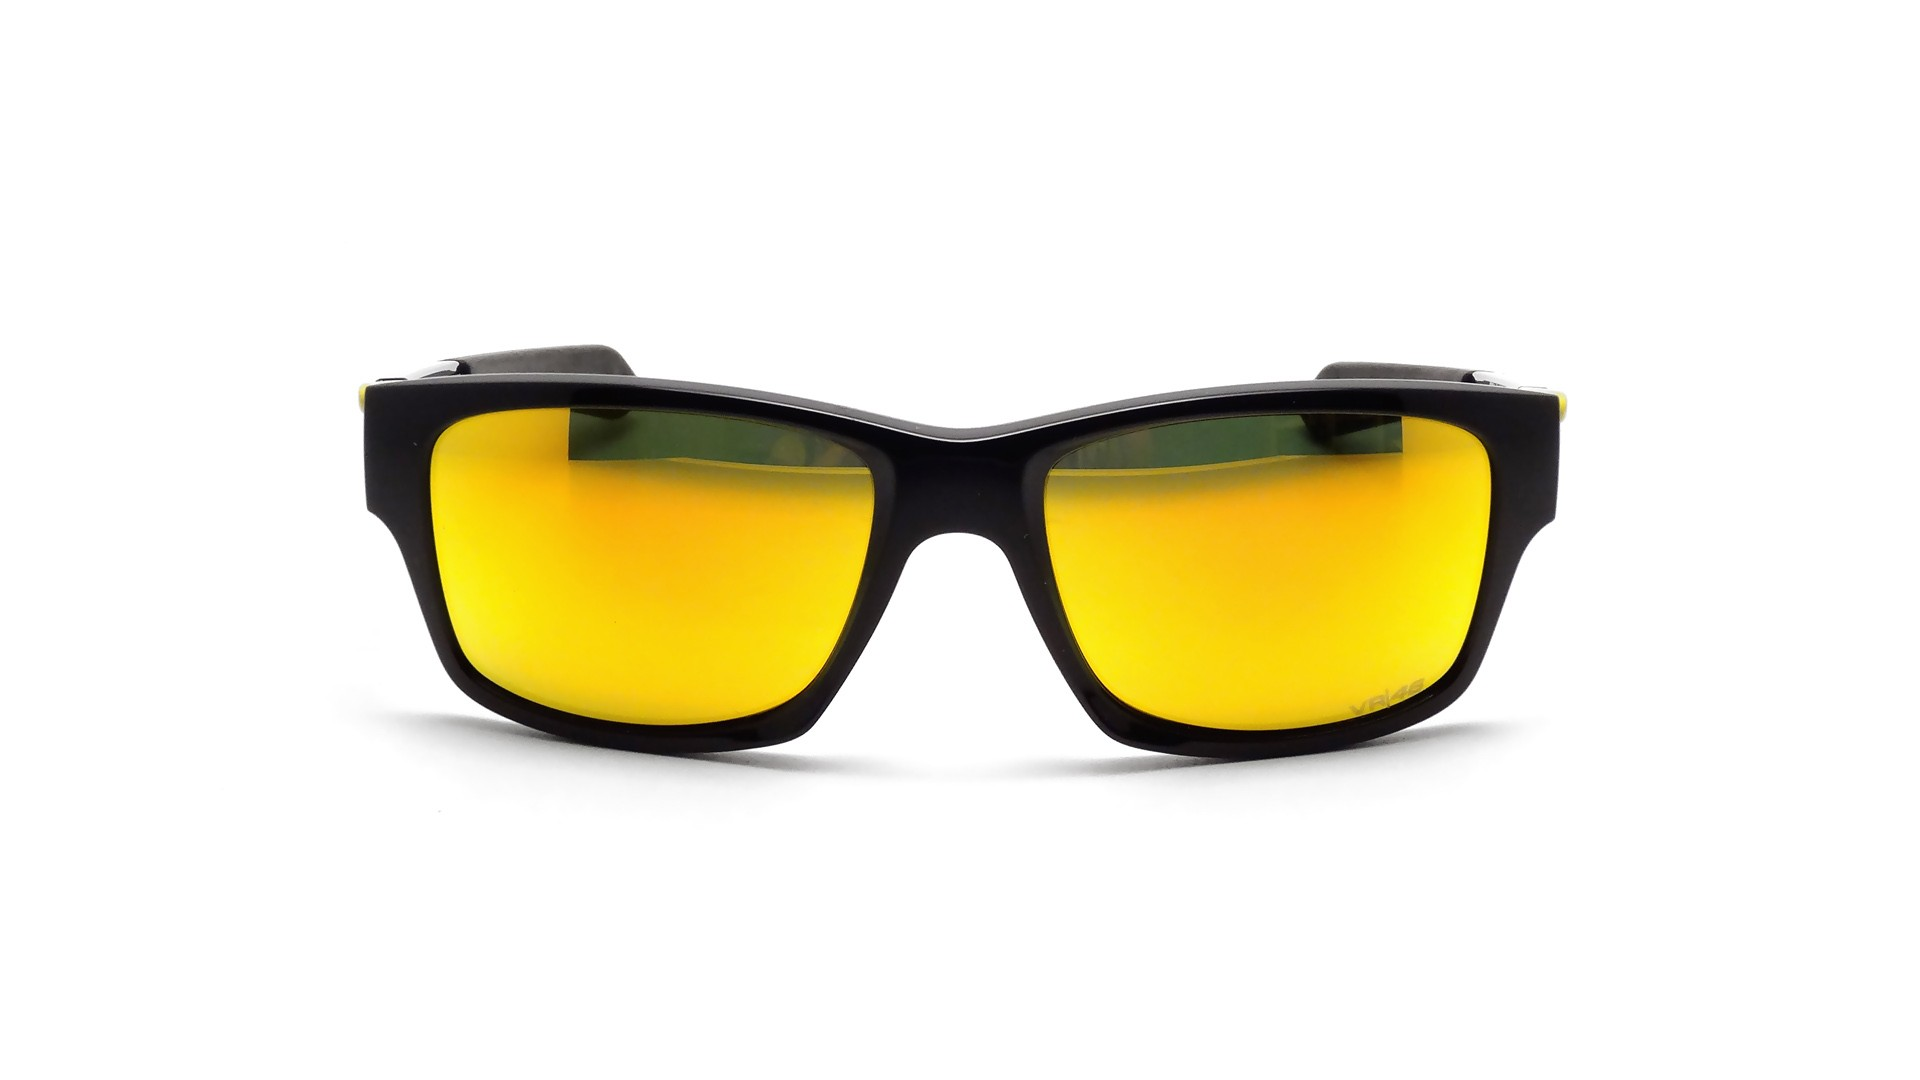 black and yellow oakley sunglasses 194m  Oakley Jupiter Valentino Rossi Edition Black OO9135 11  Visiofactory